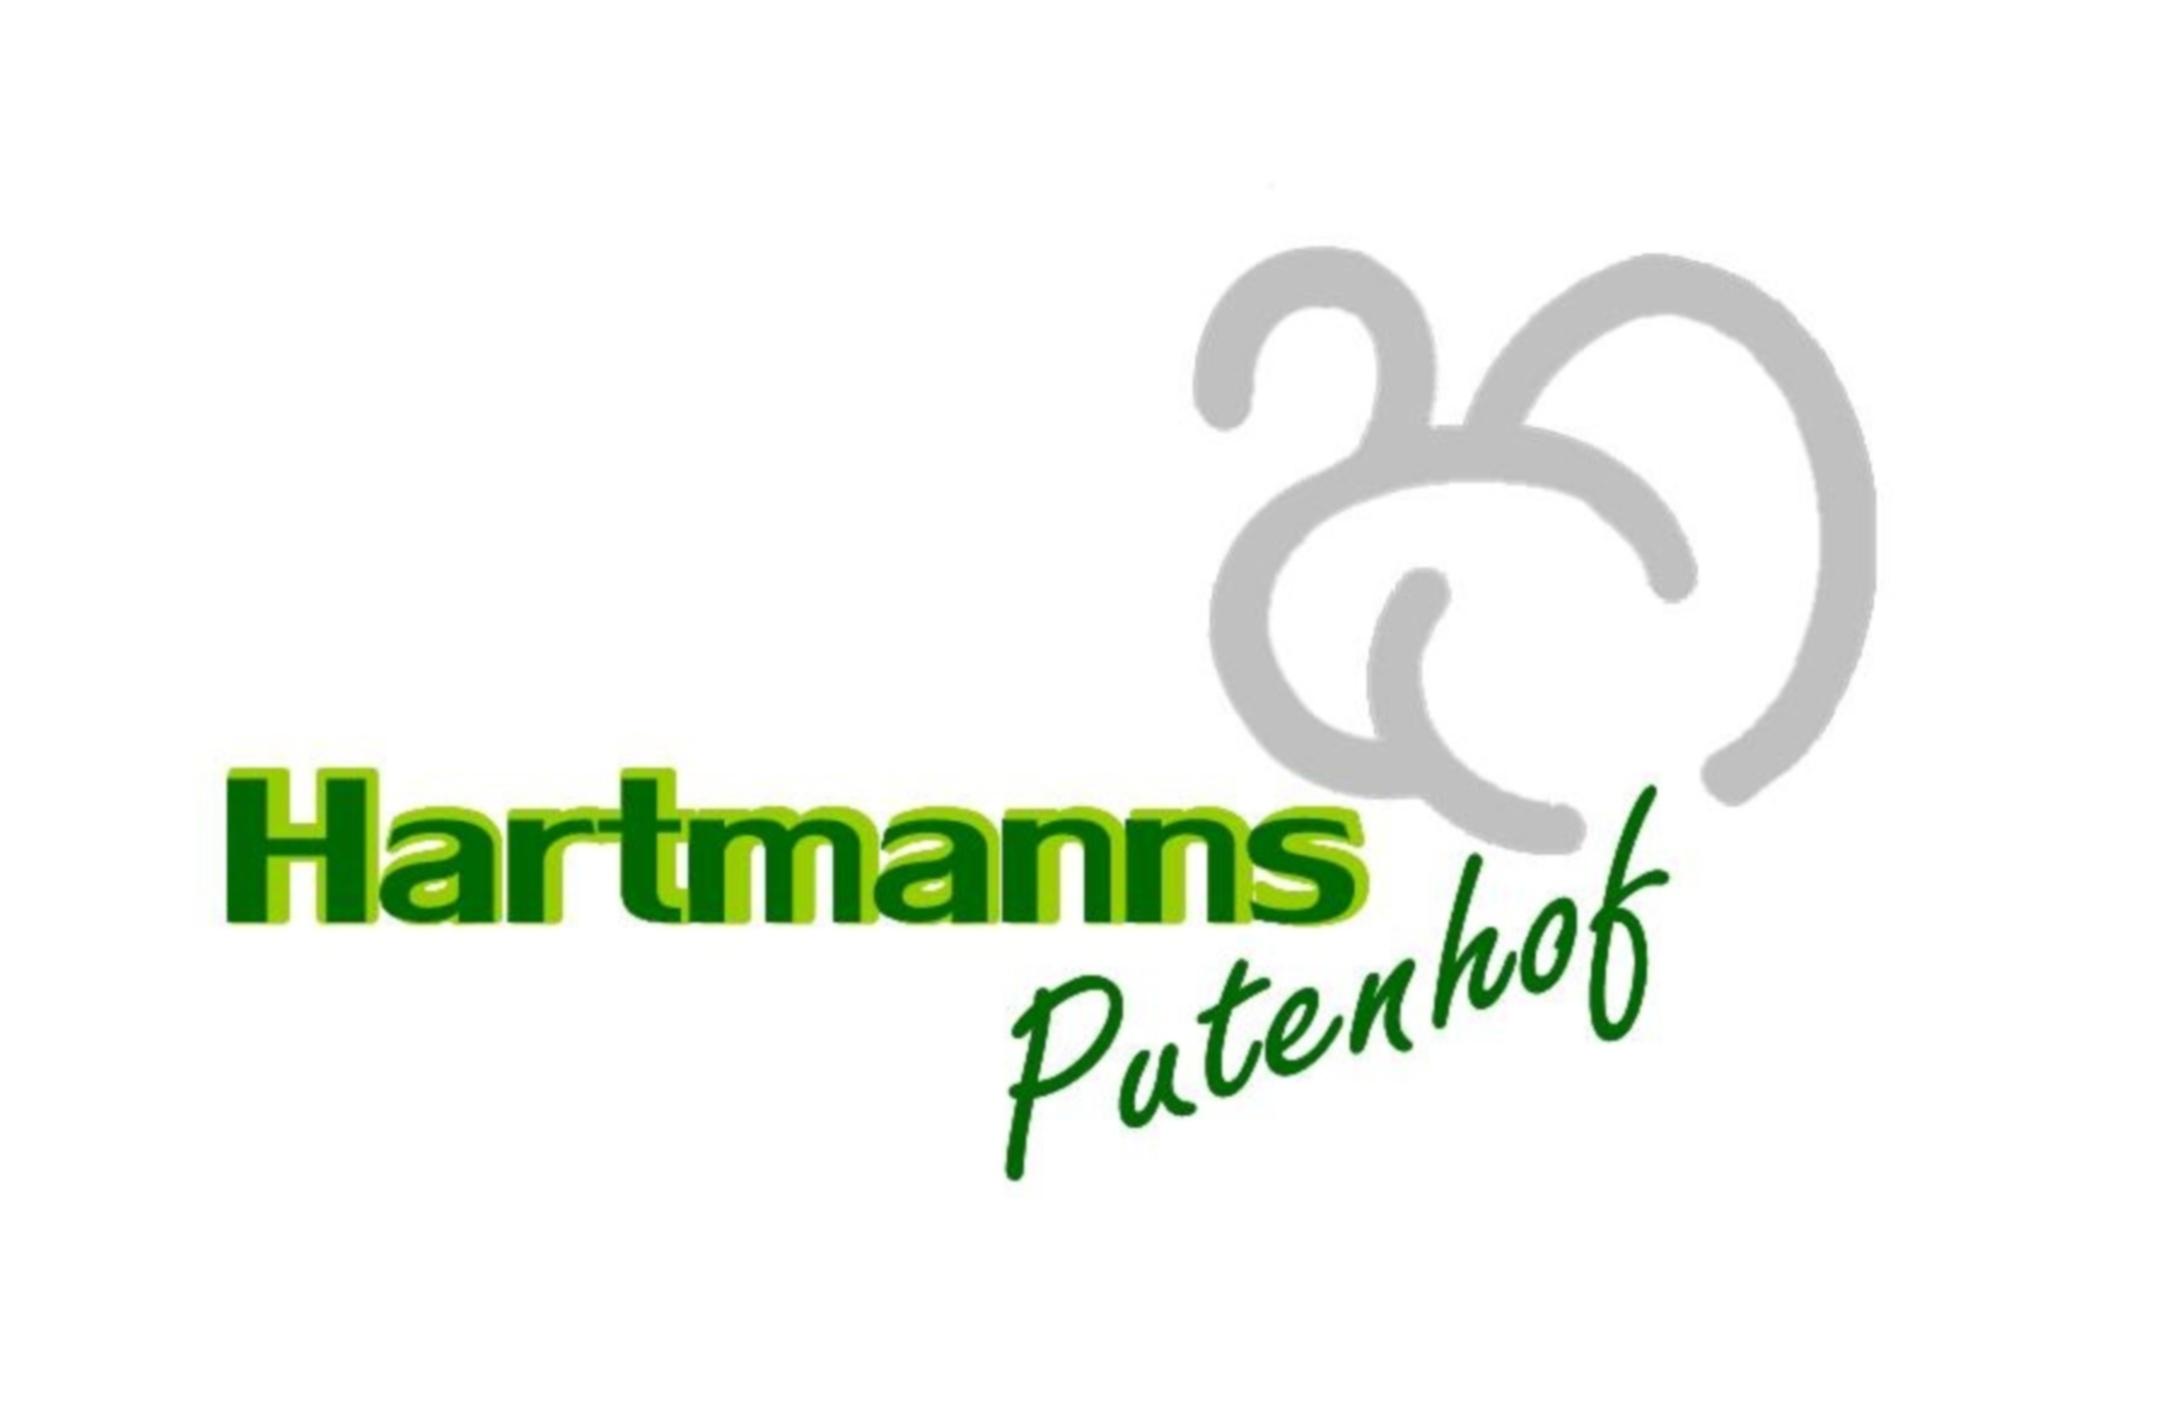 Hartmanns Putenhof